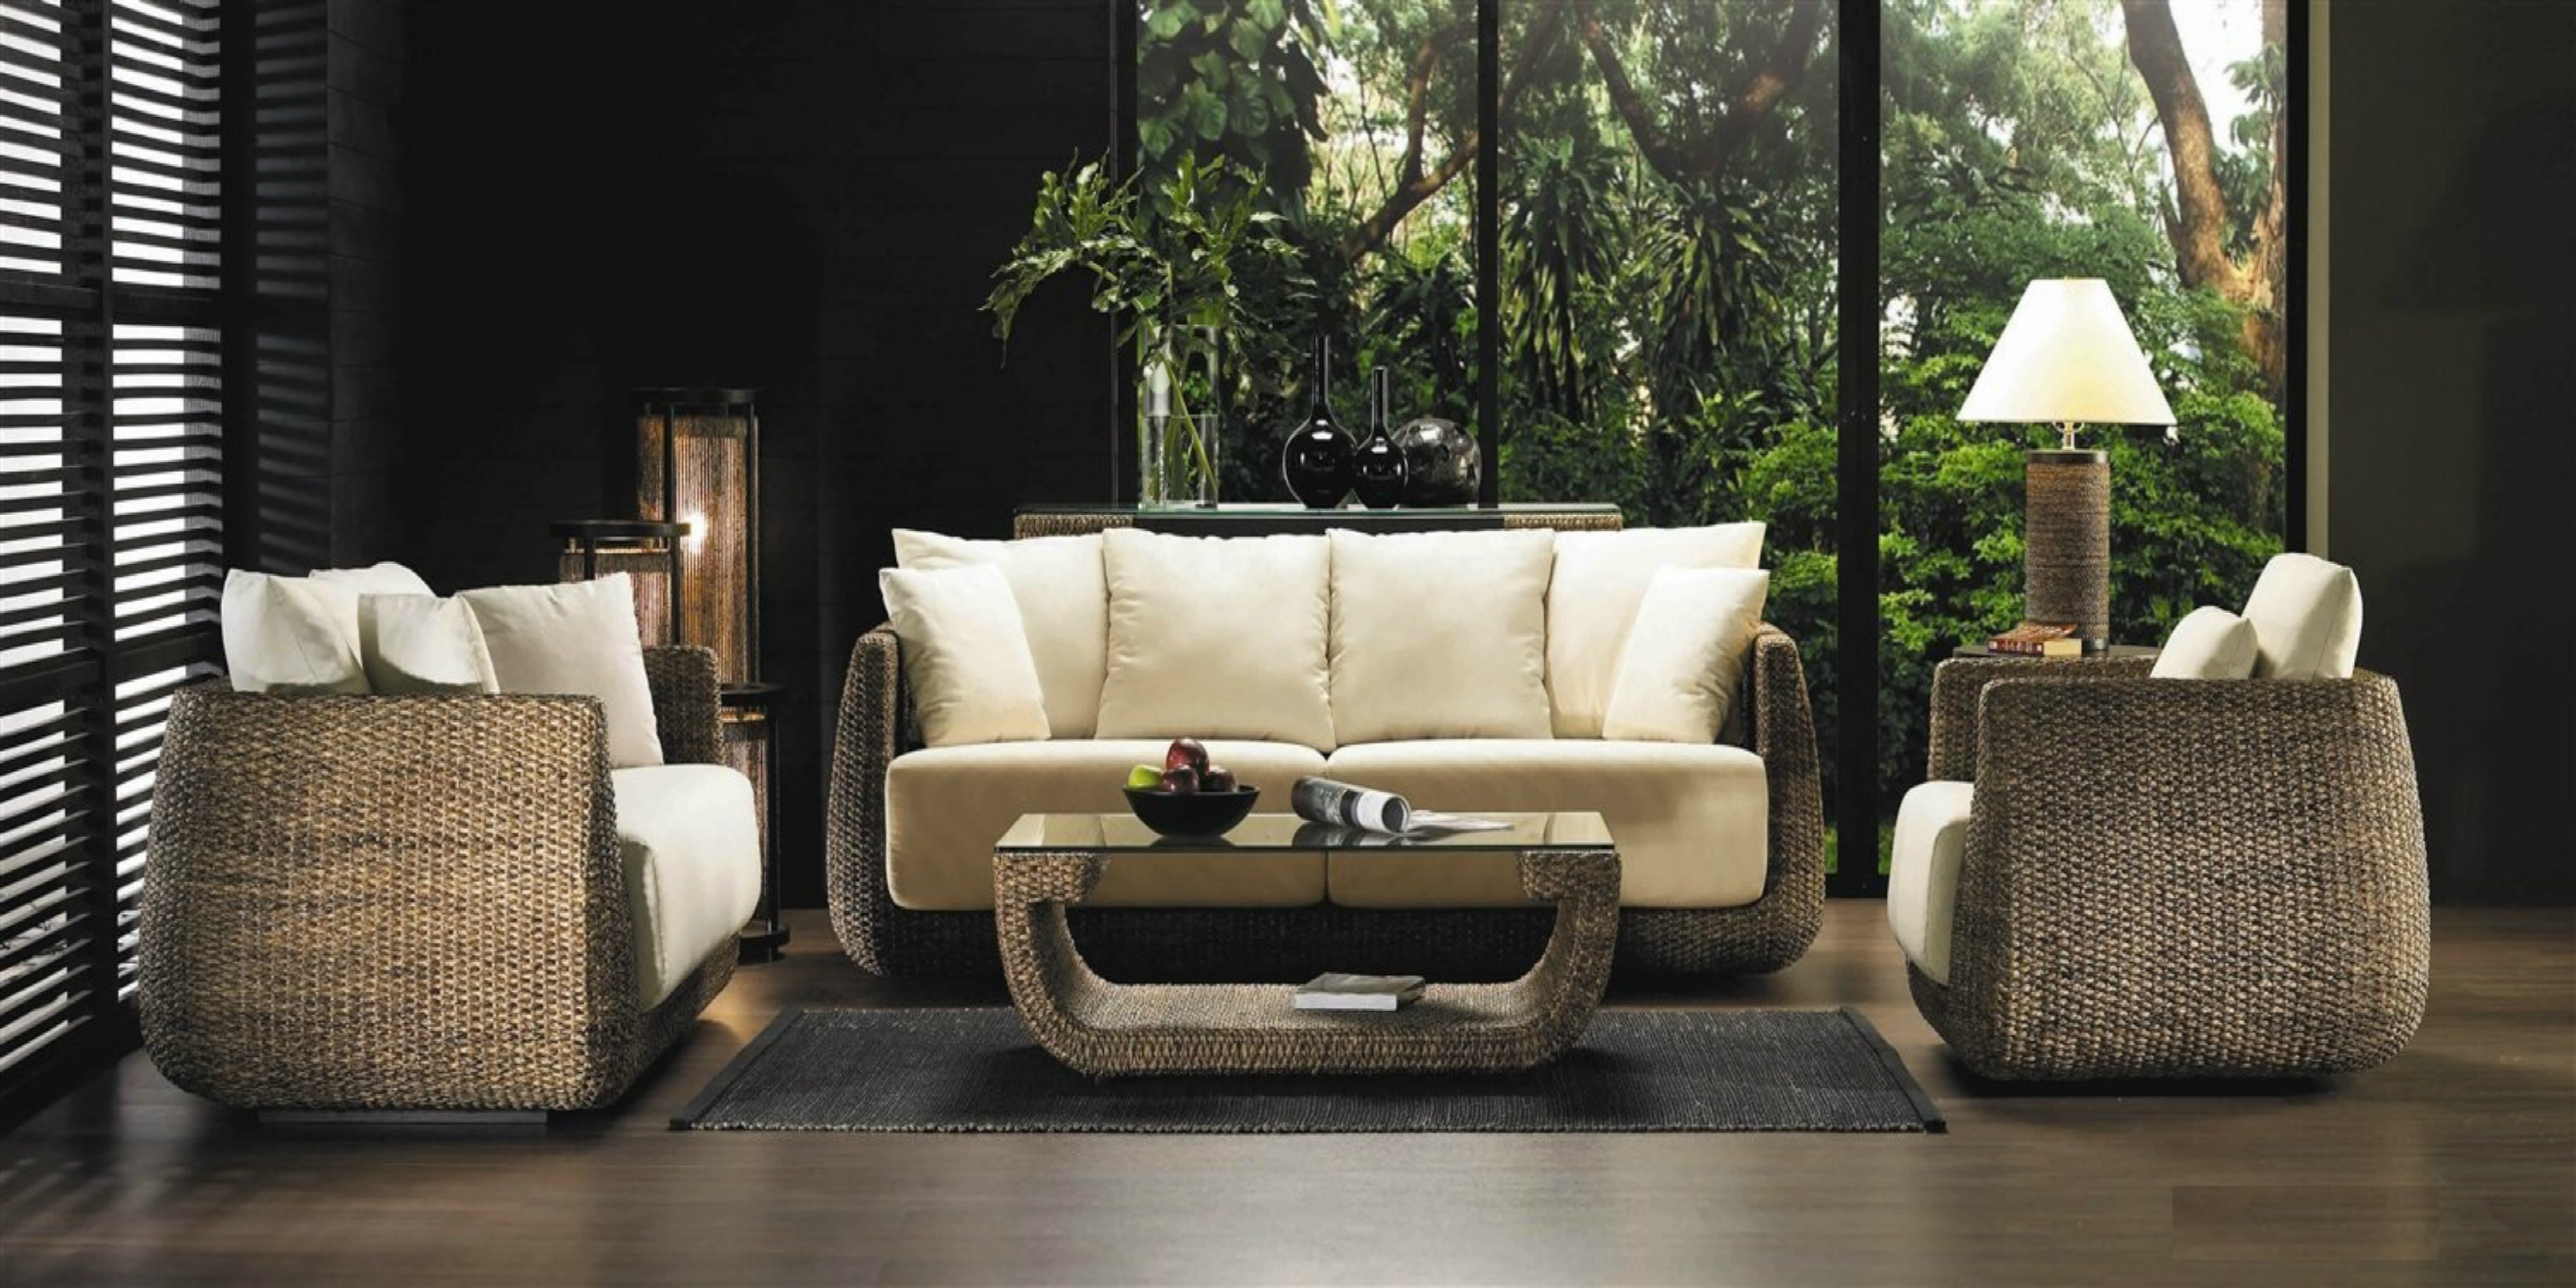 Strange Hyacinth Real Wicker 4 Piece Indoor Furniture Set W Sofa Ncnpc Chair Design For Home Ncnpcorg